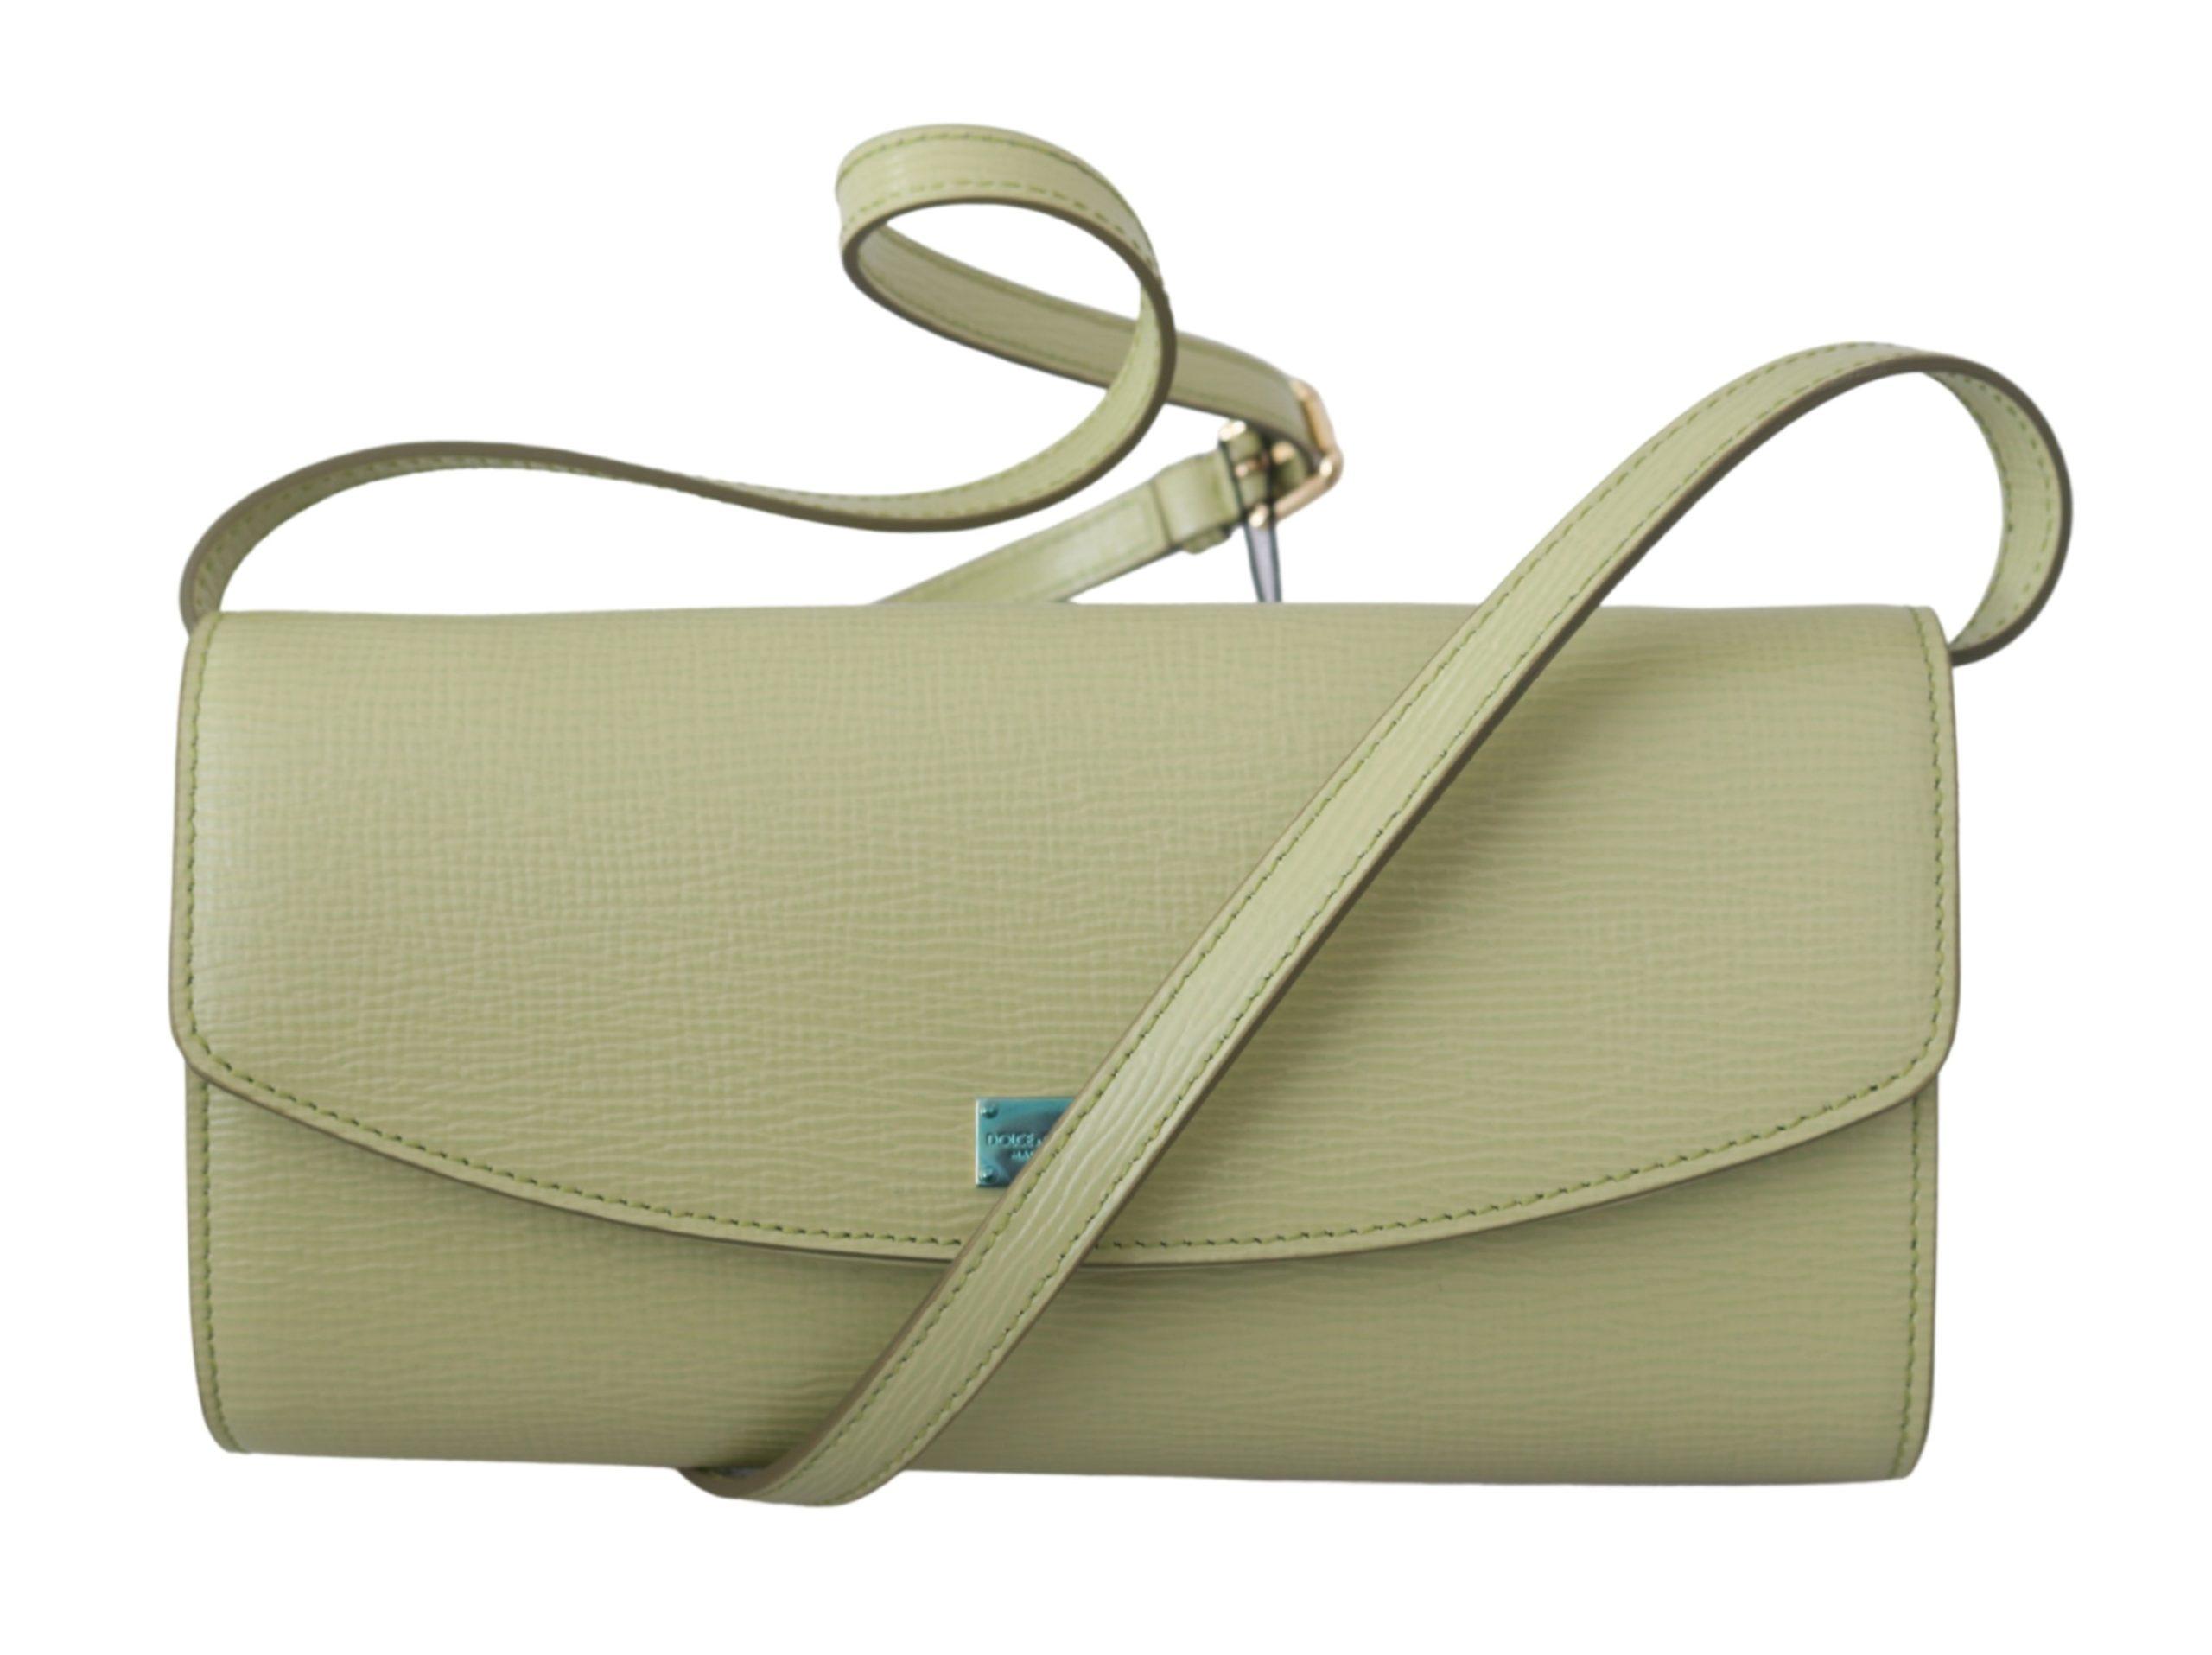 Dolce & Gabbana Women's Long Clutch Leather Bag Beige VAS9207